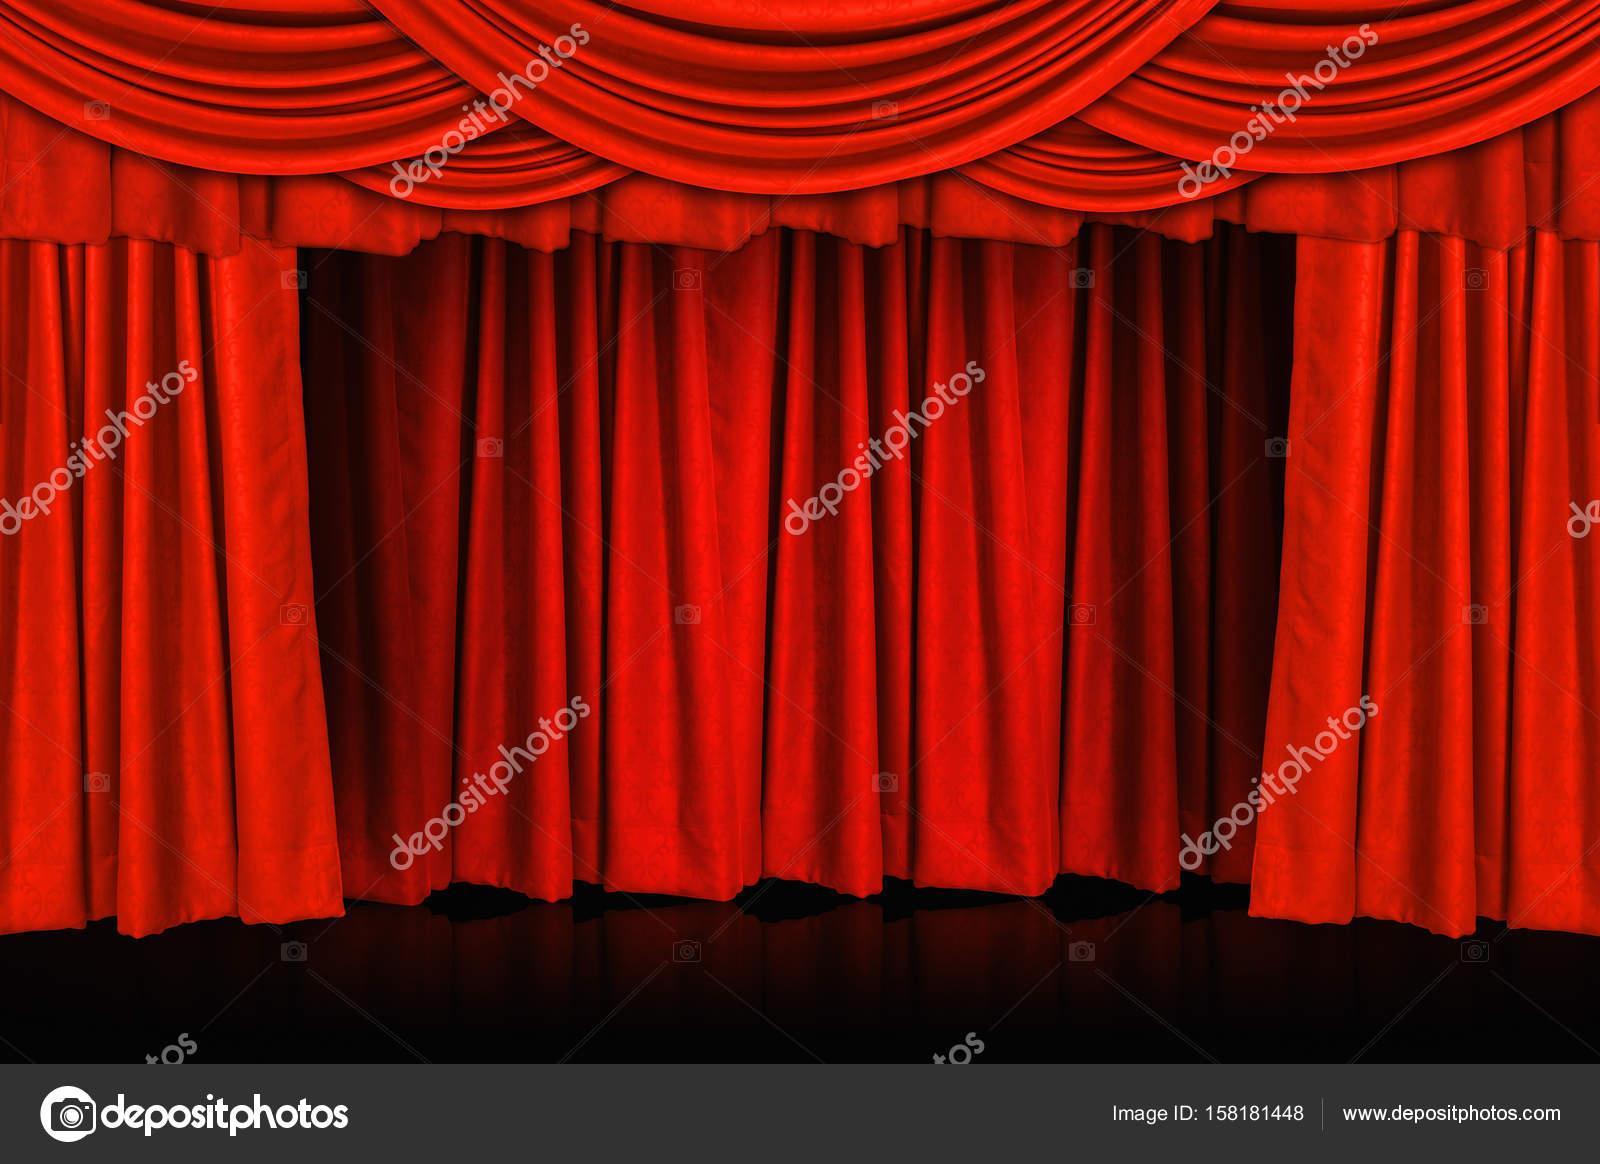 Rode gordijnen en podium vloer — Stockfoto © nirutdps #158181448